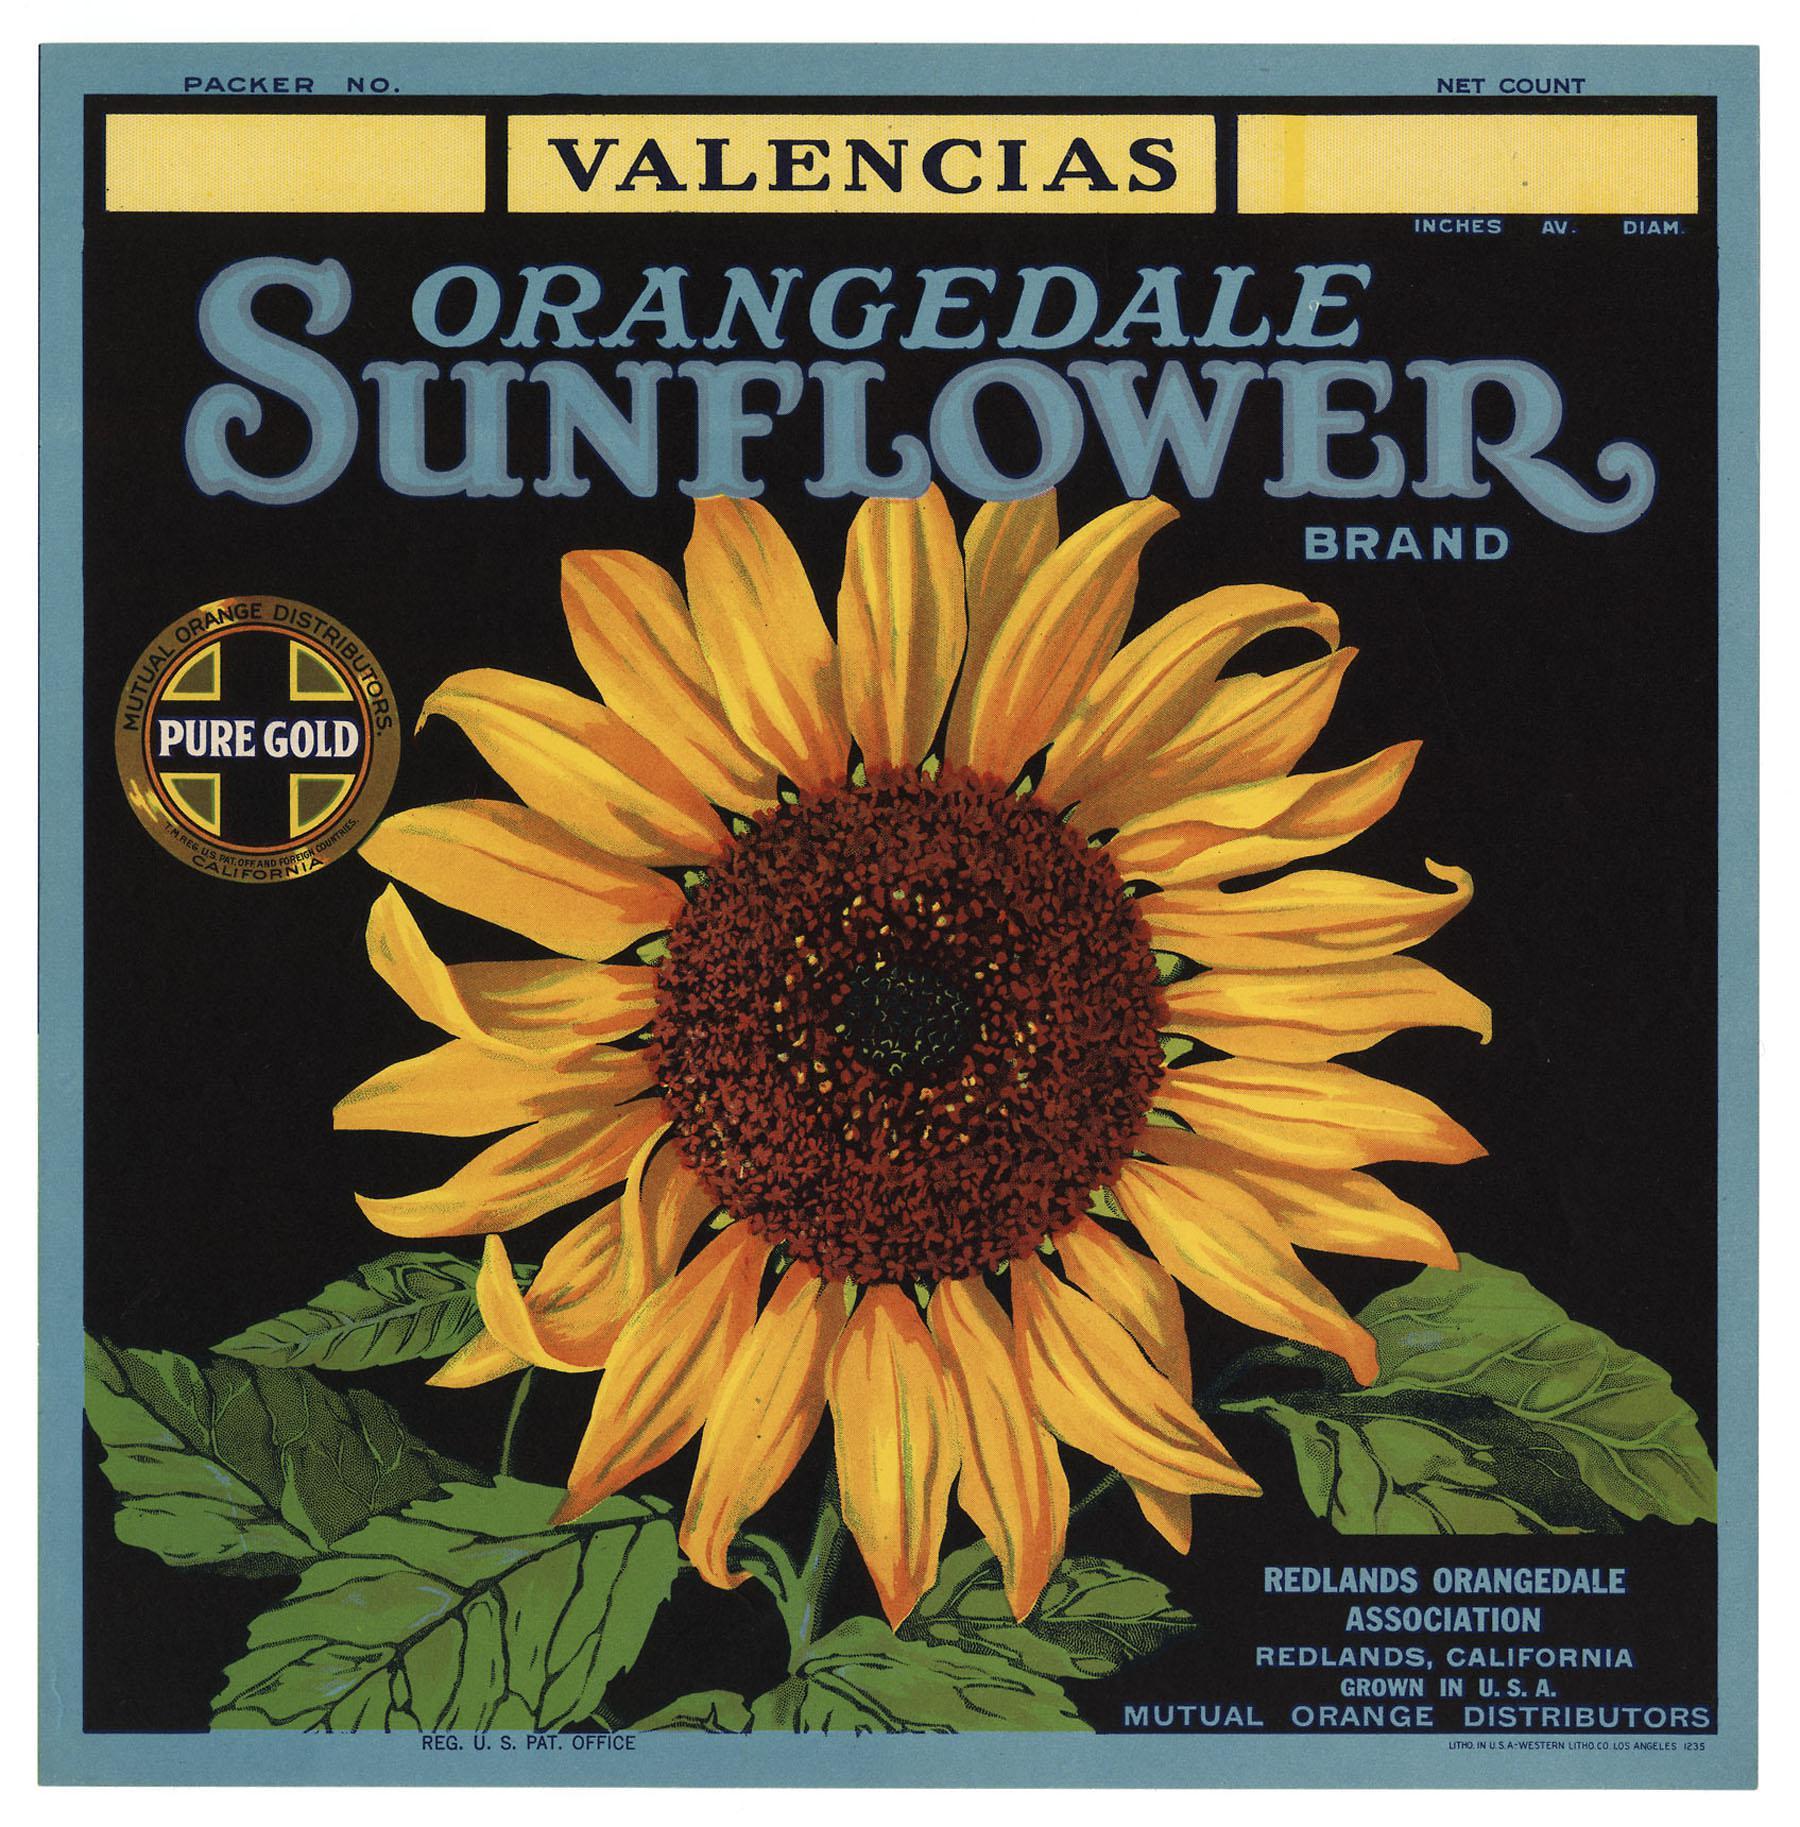 Valencias Orangedale Sunflower Brand Redlands Orangedale Assn California Label